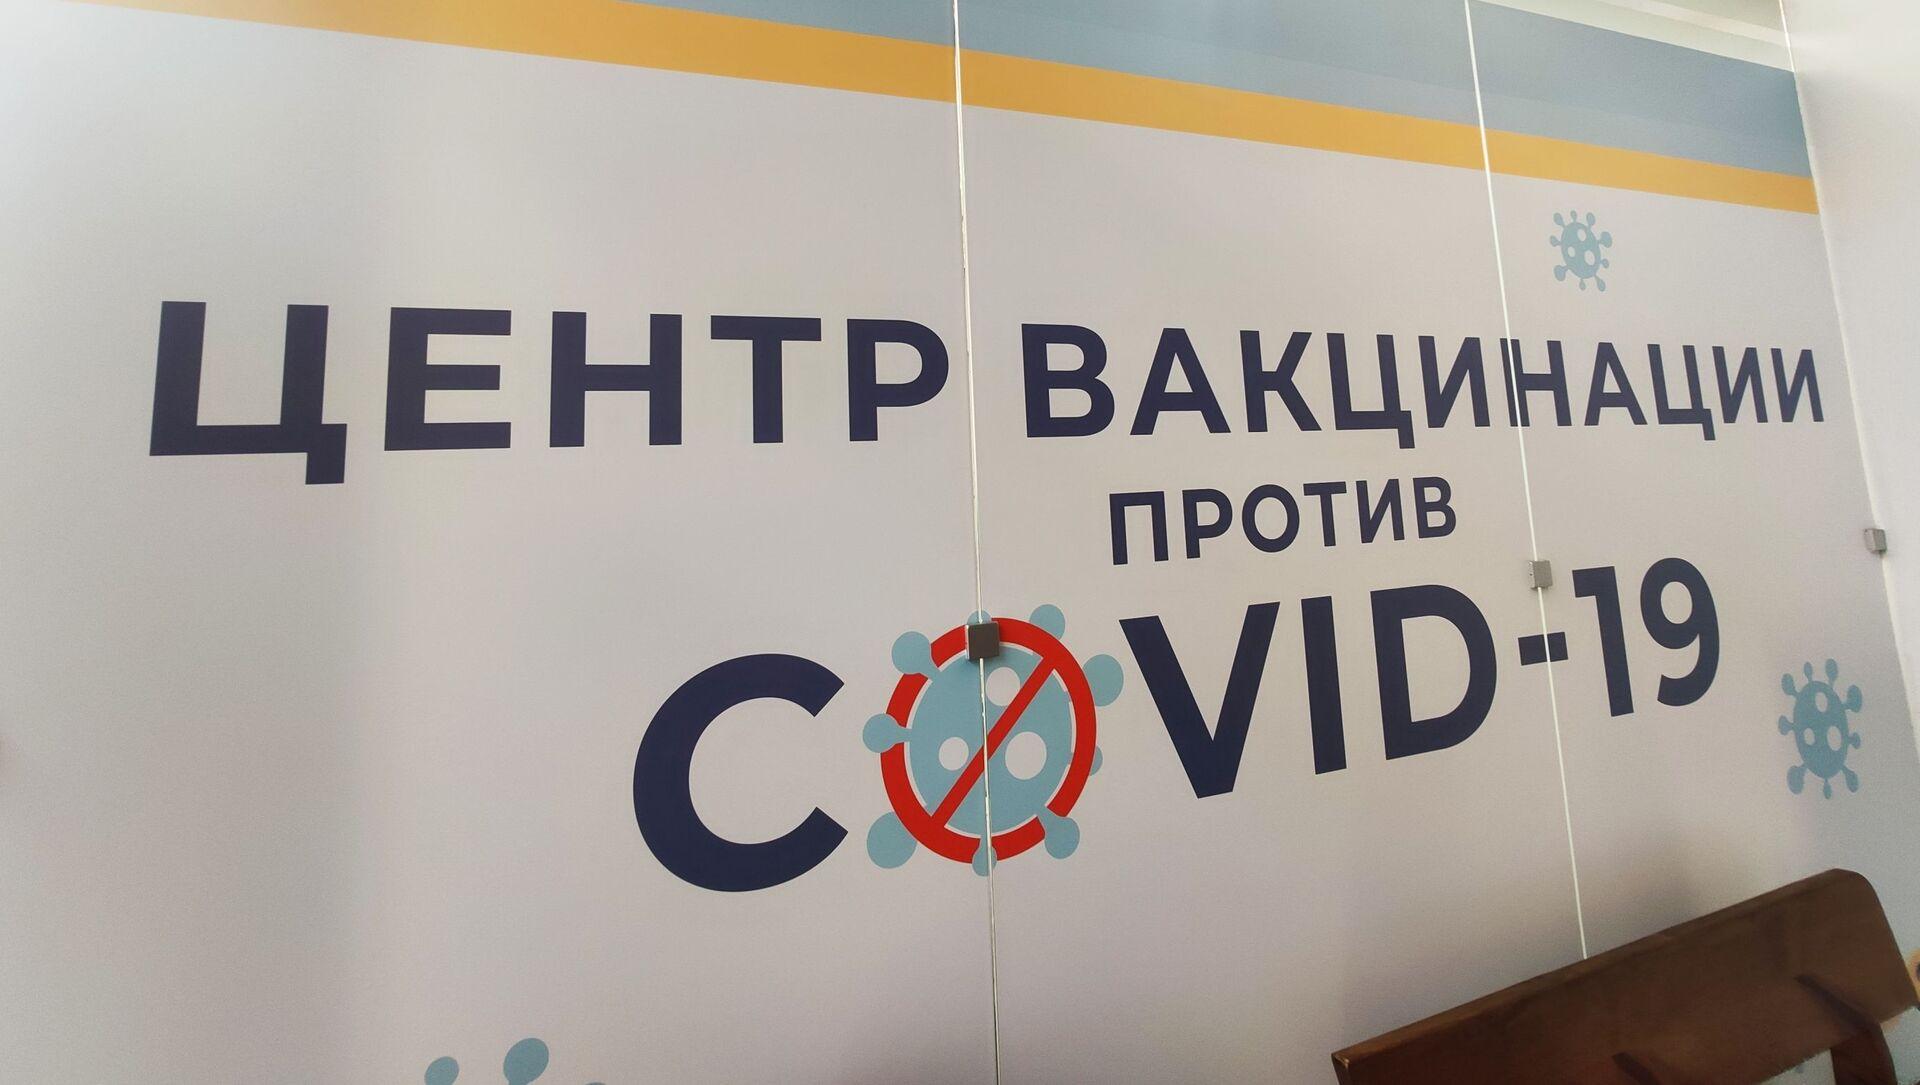 Центр вакцинации - Sputnik Беларусь, 1920, 13.05.2021